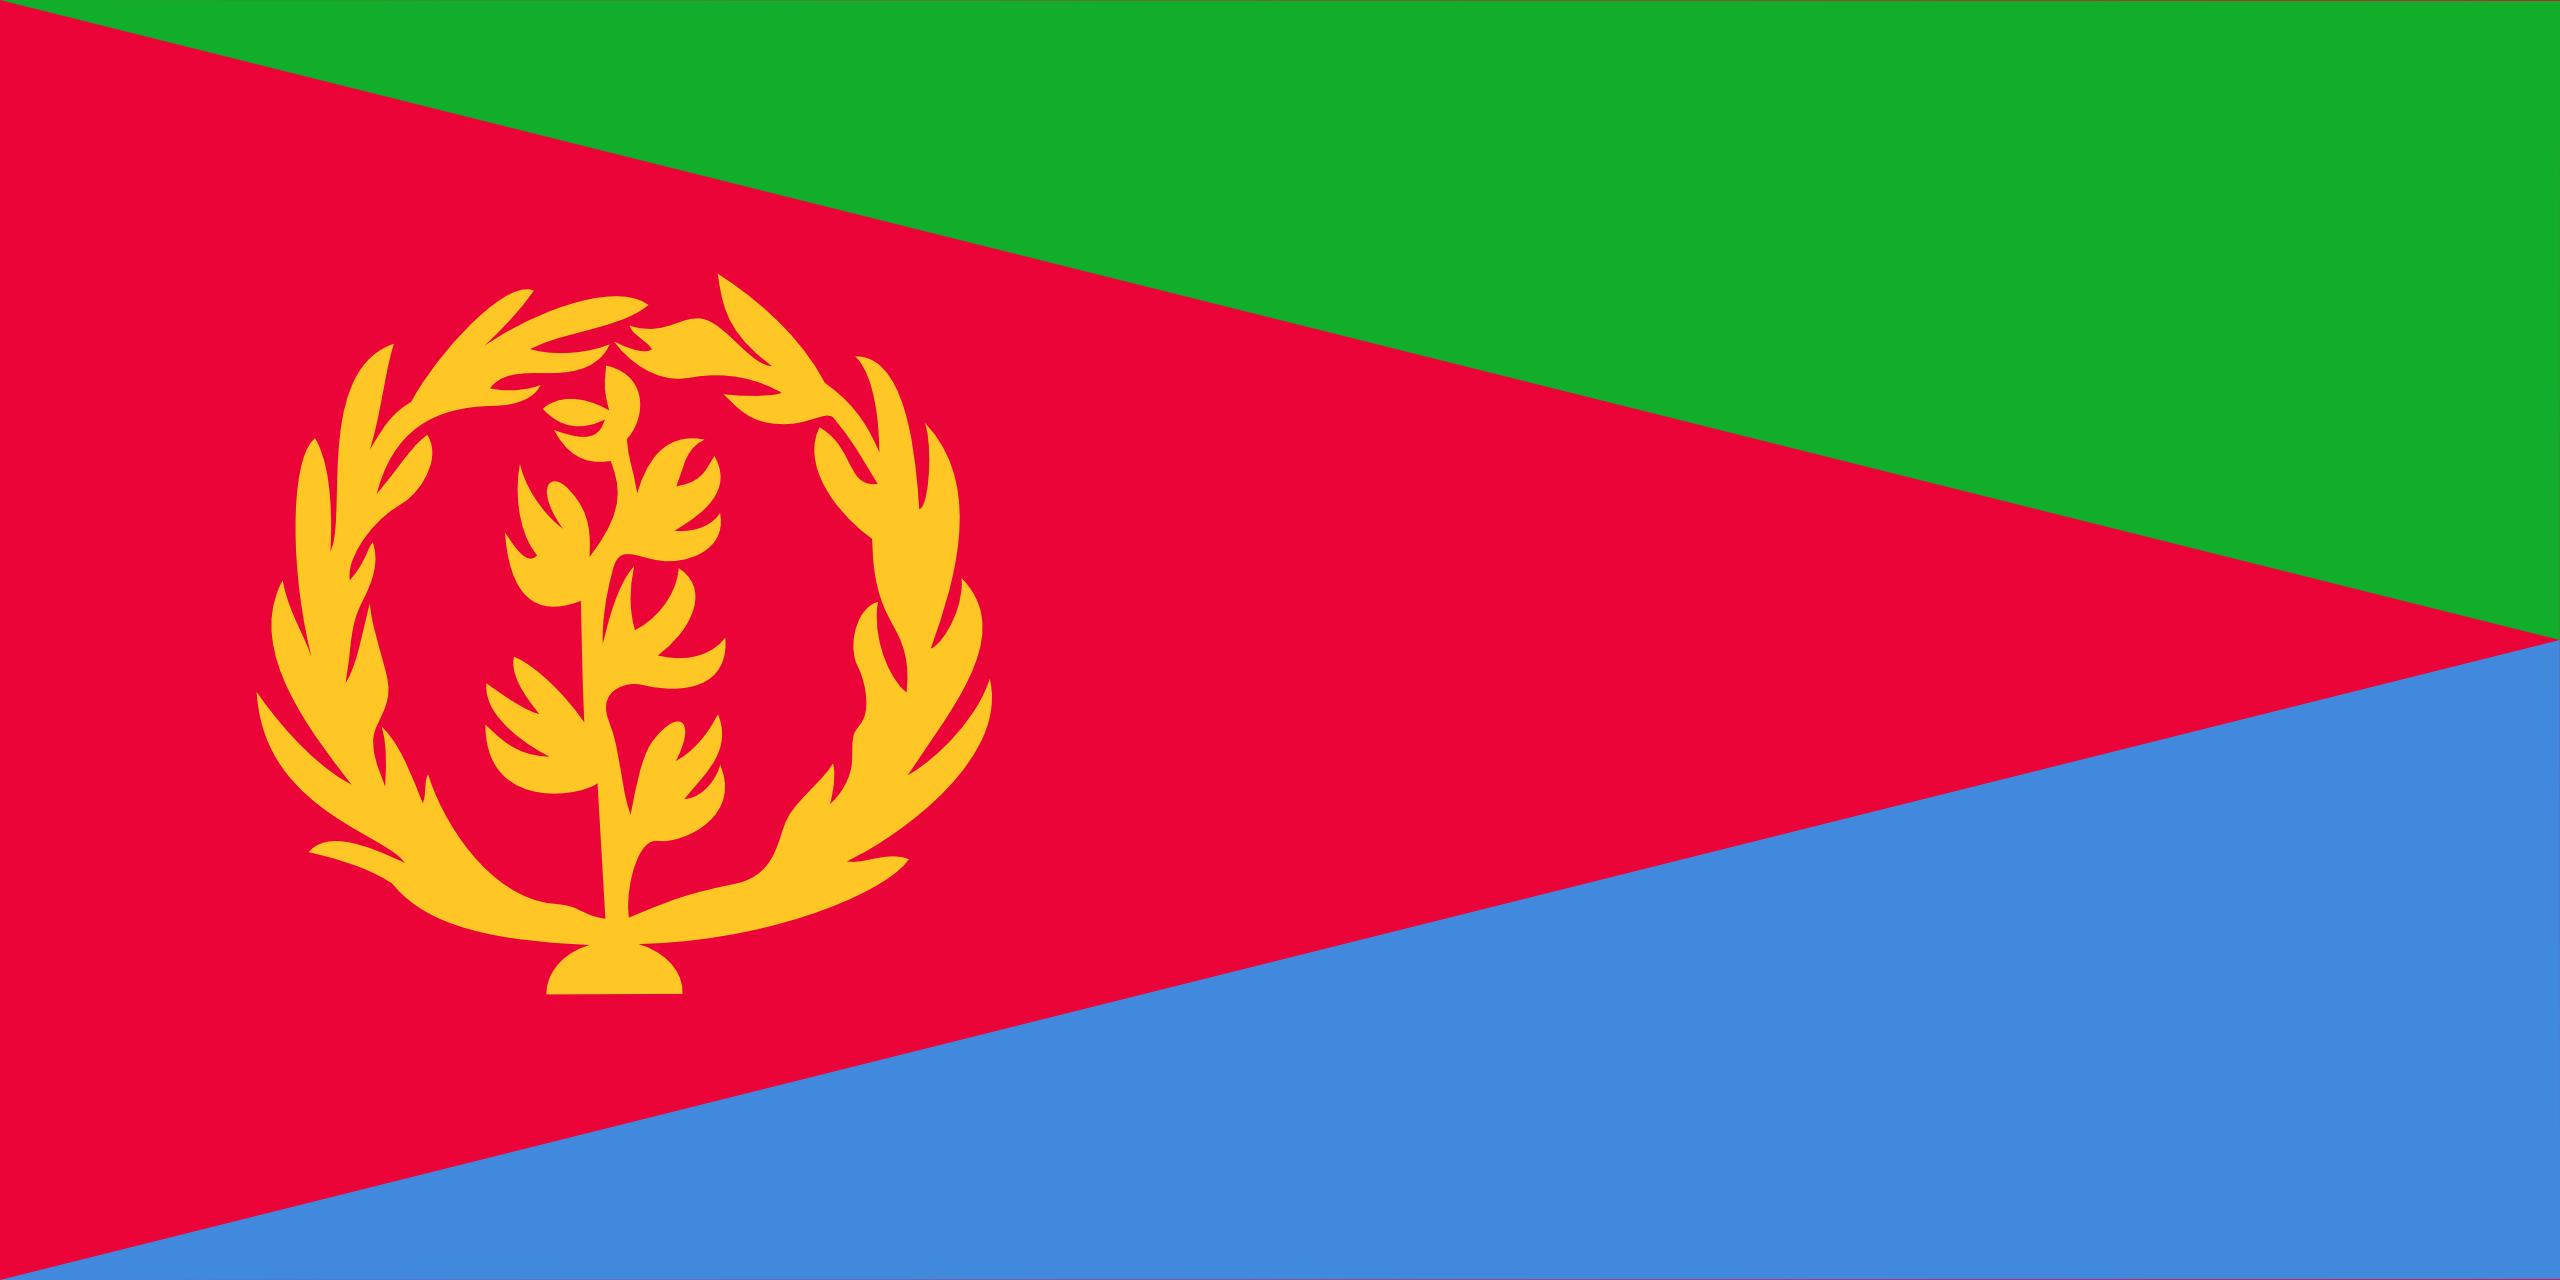 eritrea, país, emblema, insignia, символ - Обои HD - Профессор falken.com